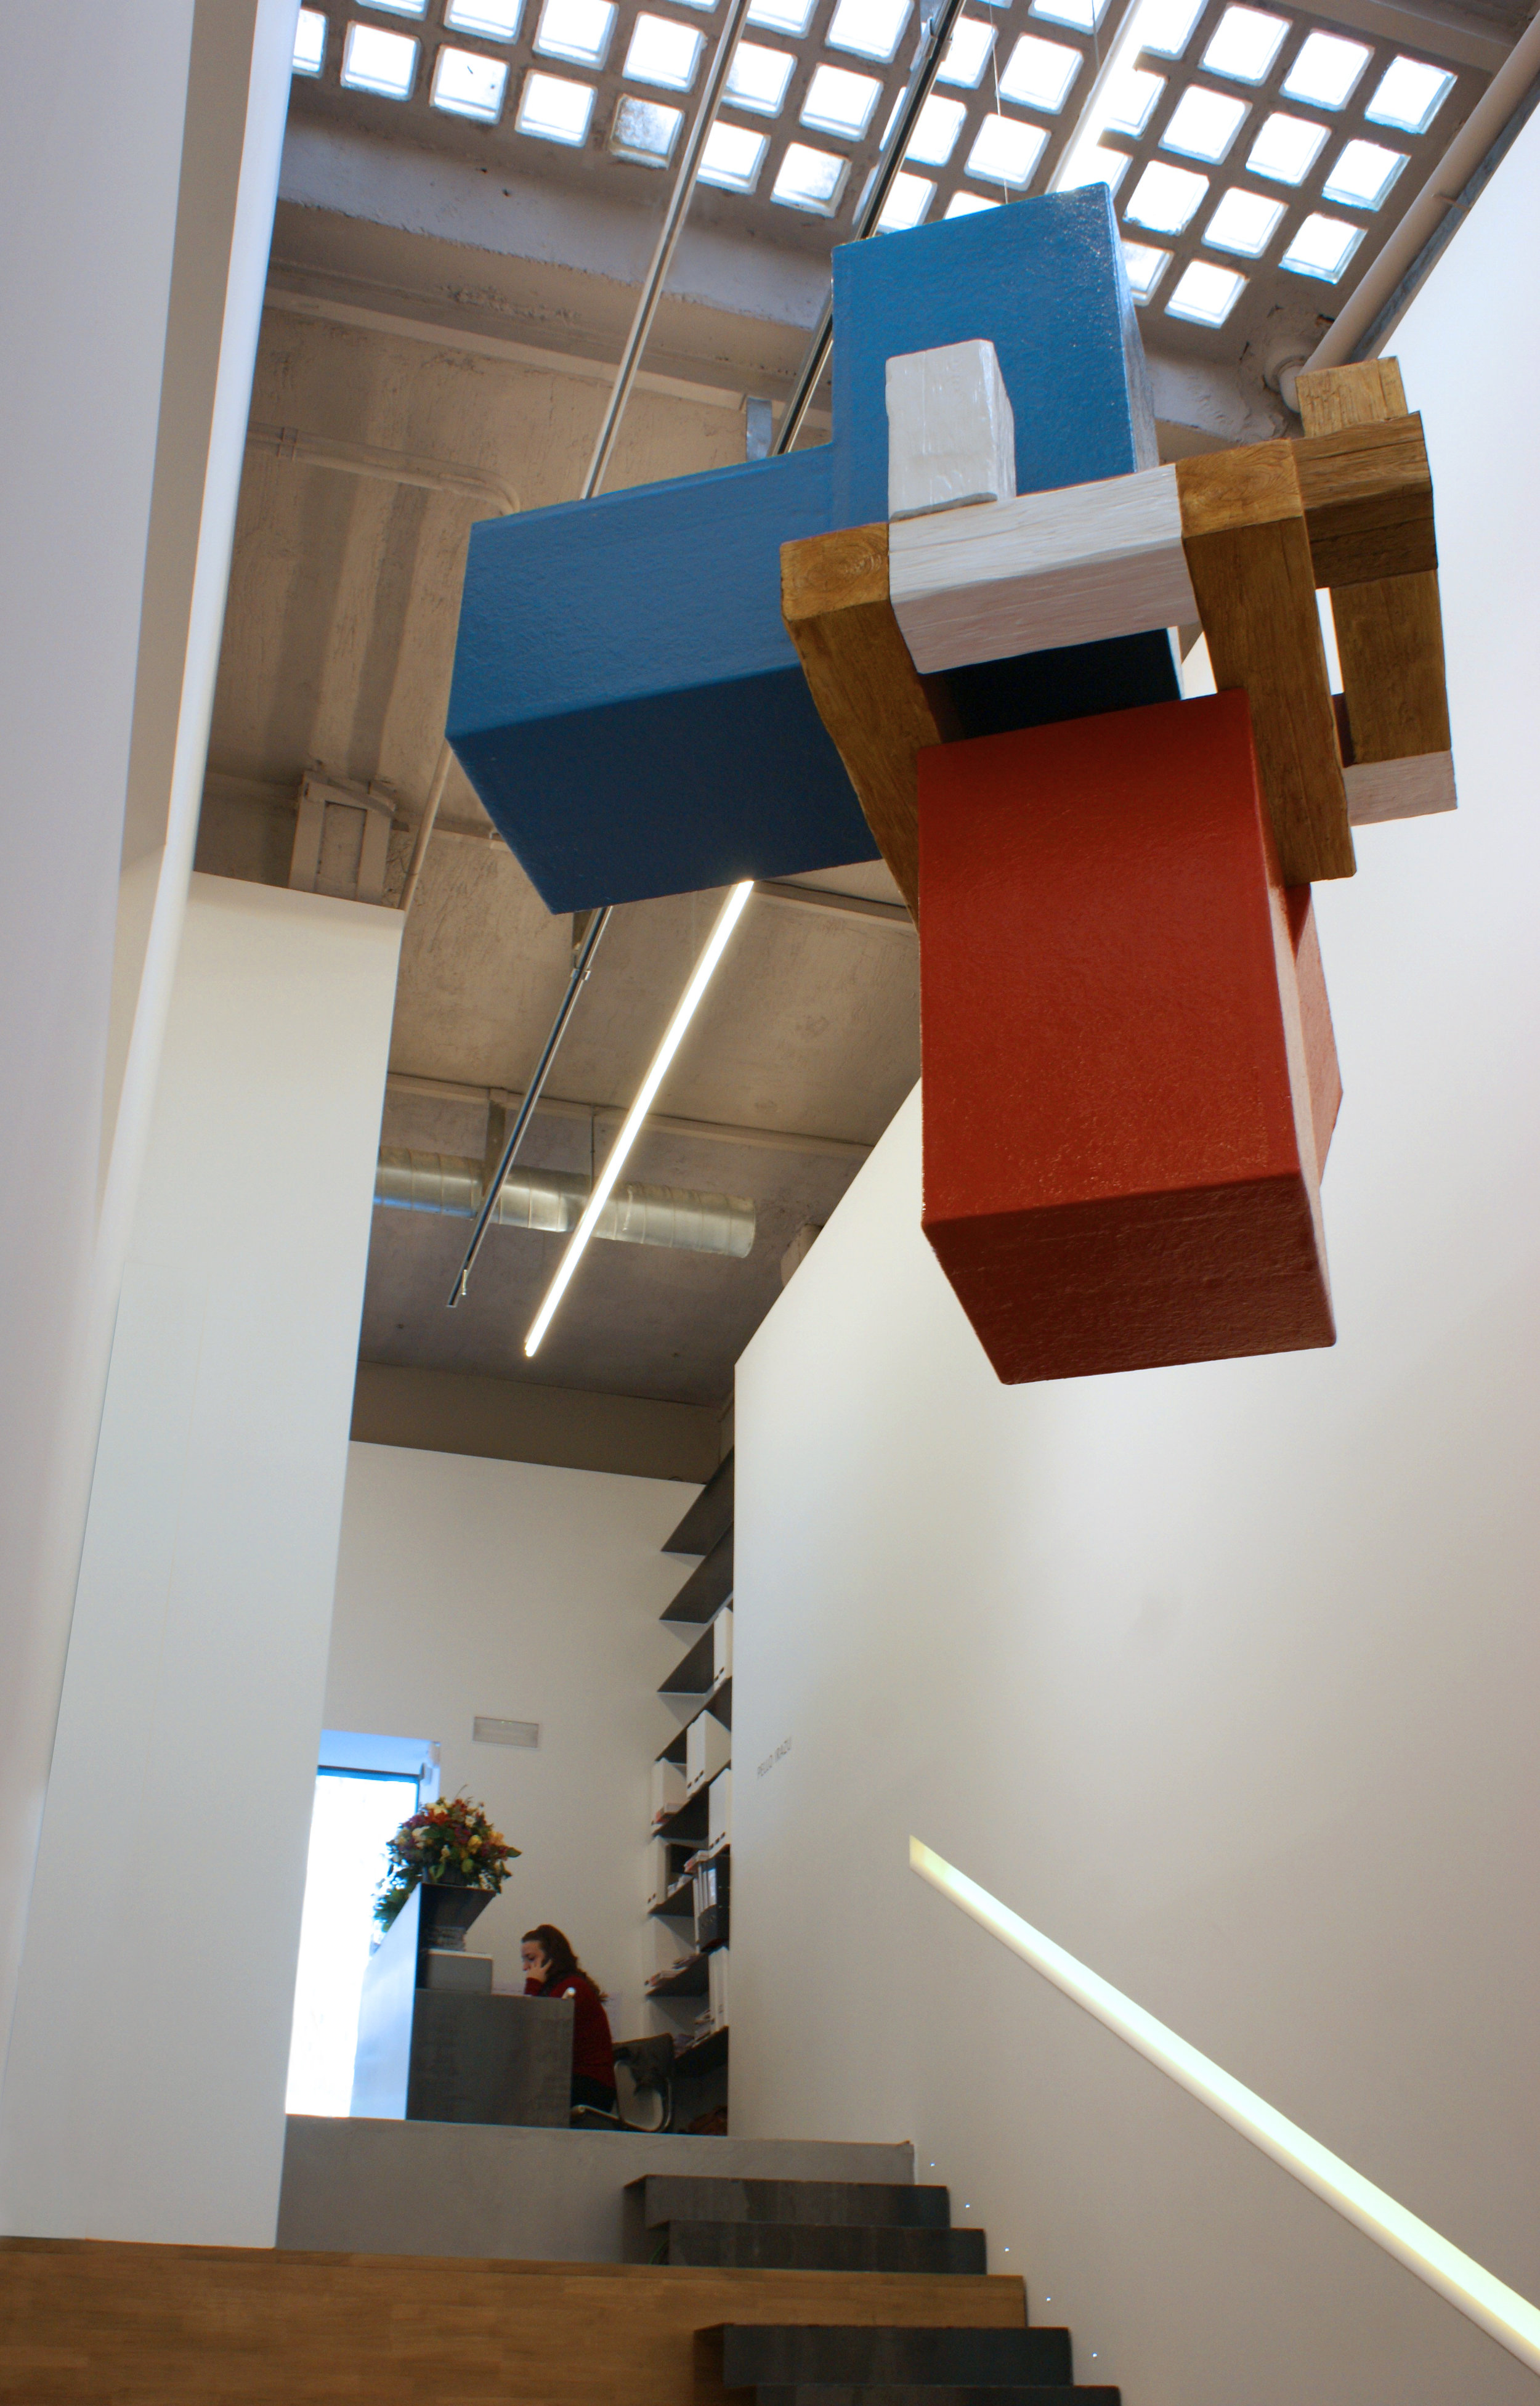 Pello Irazu   Visitor (Gabriel) [ Visitante (Gabriel) ], 2013 Structure made of cardboard, wood, polyurethane, fiberglass, and paint 188 x 139 x 146 cm Collection of the artist © VEGAP, Bilbao, 2017